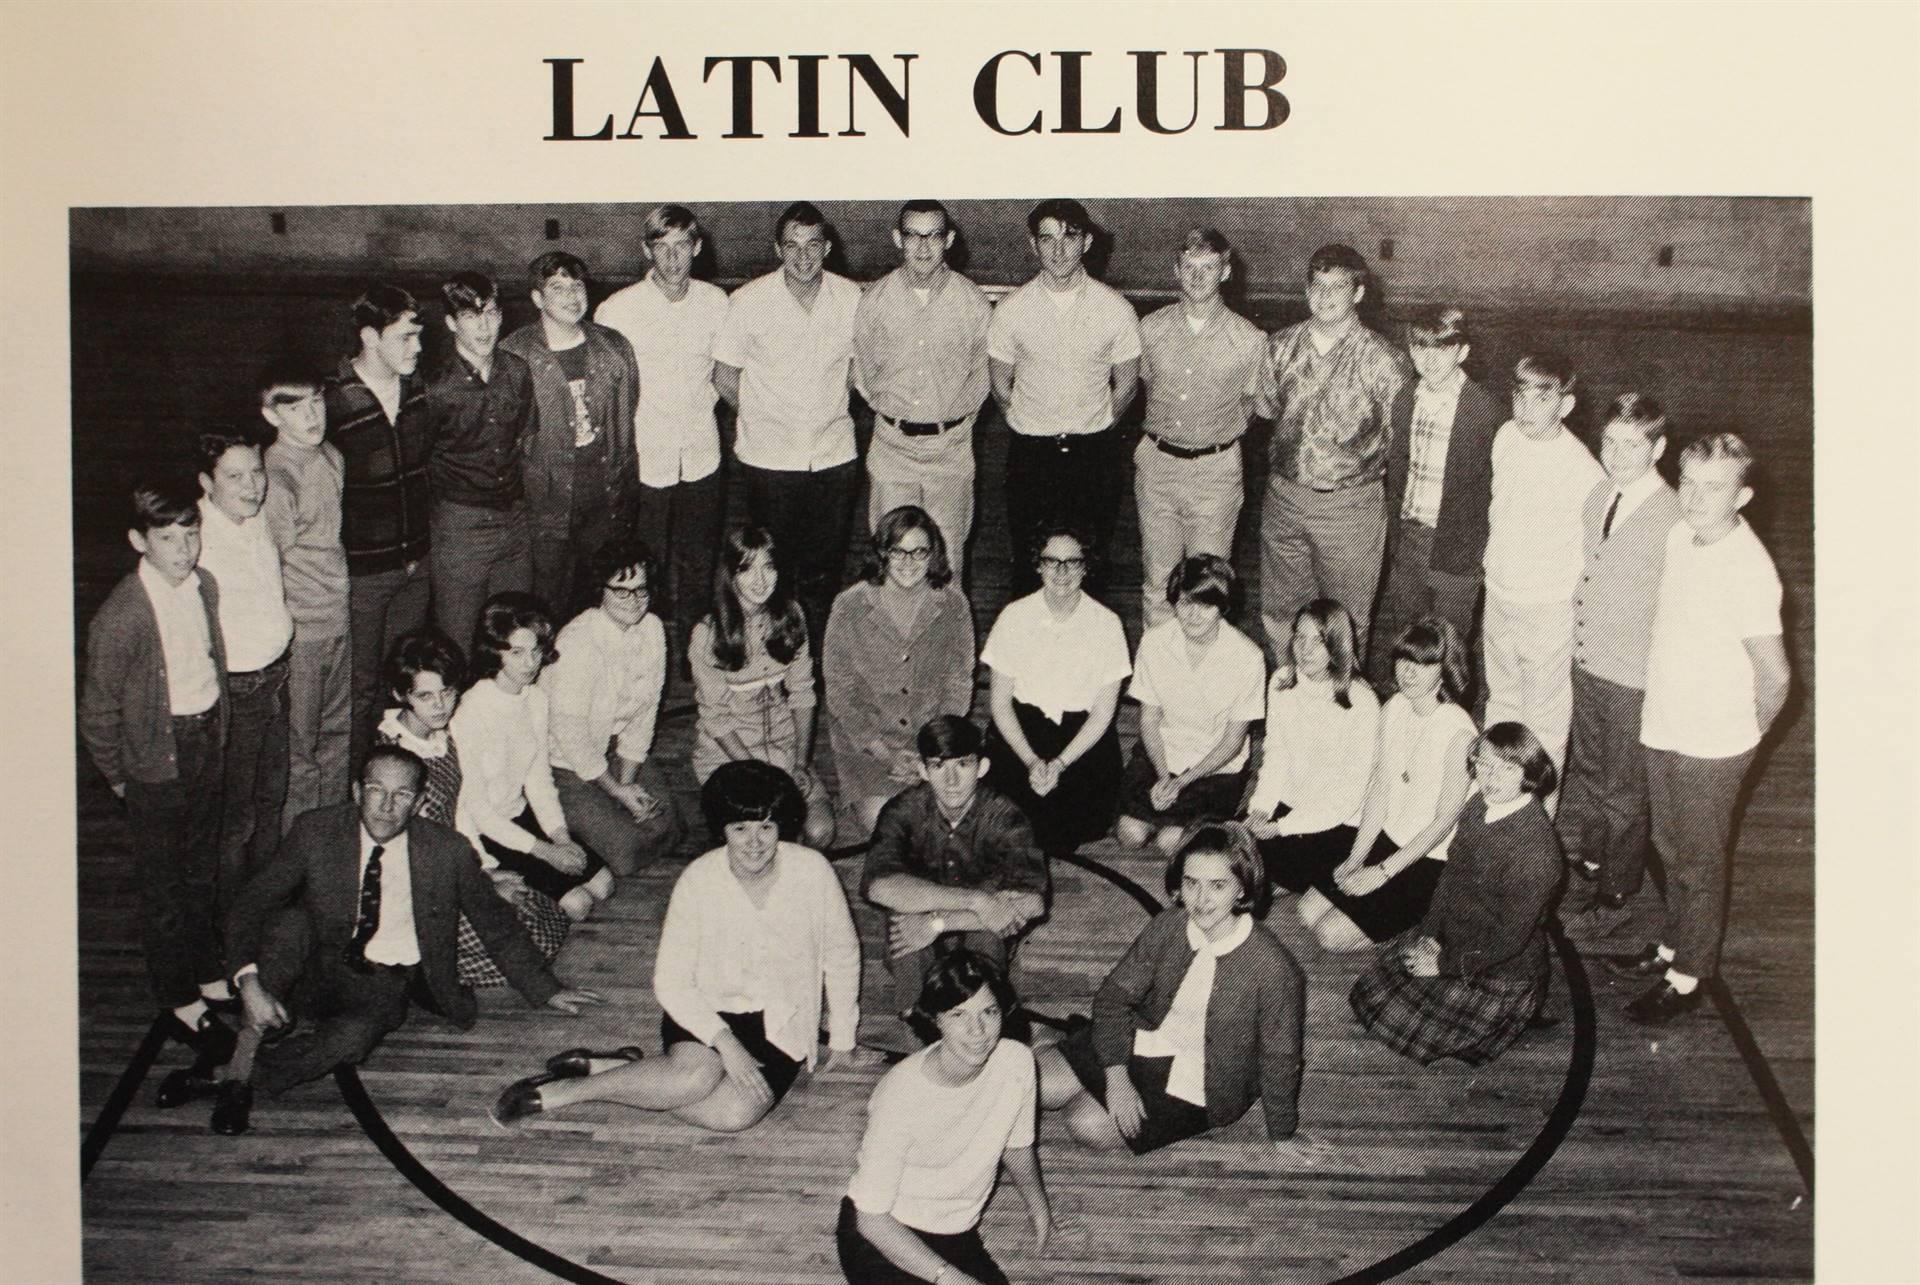 1969 Latin